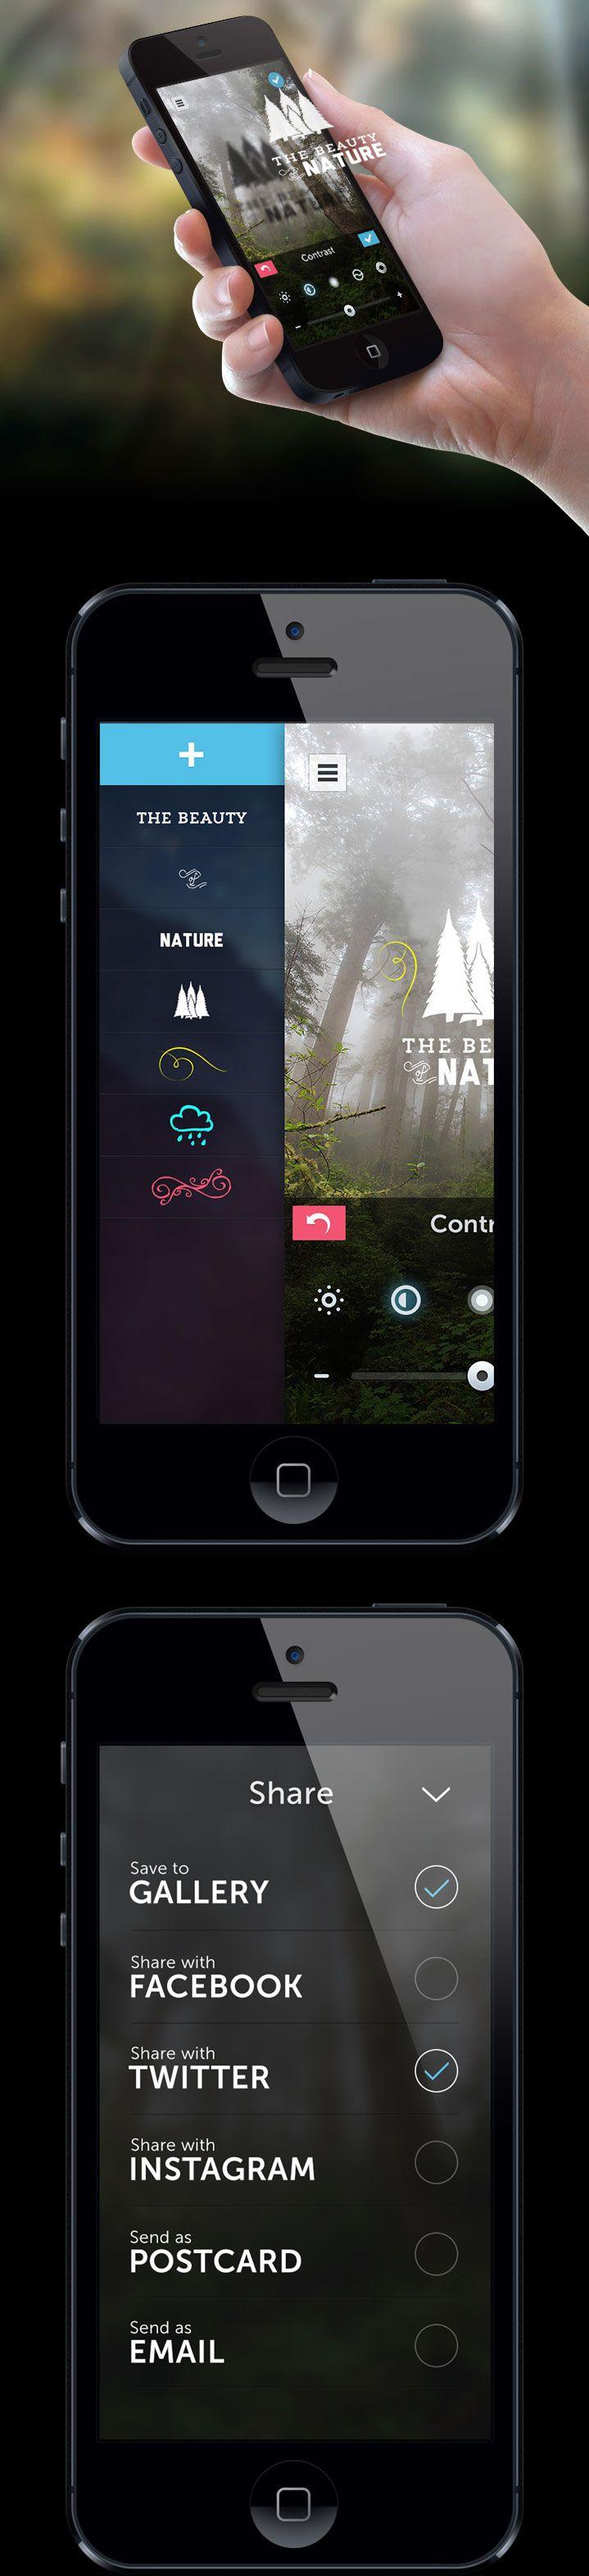 PicLab HD - iOS Universal Photo Editor #ResponsiveDesign #Design #WebDesign #Web #UI #UX GUI #Mobile #Website